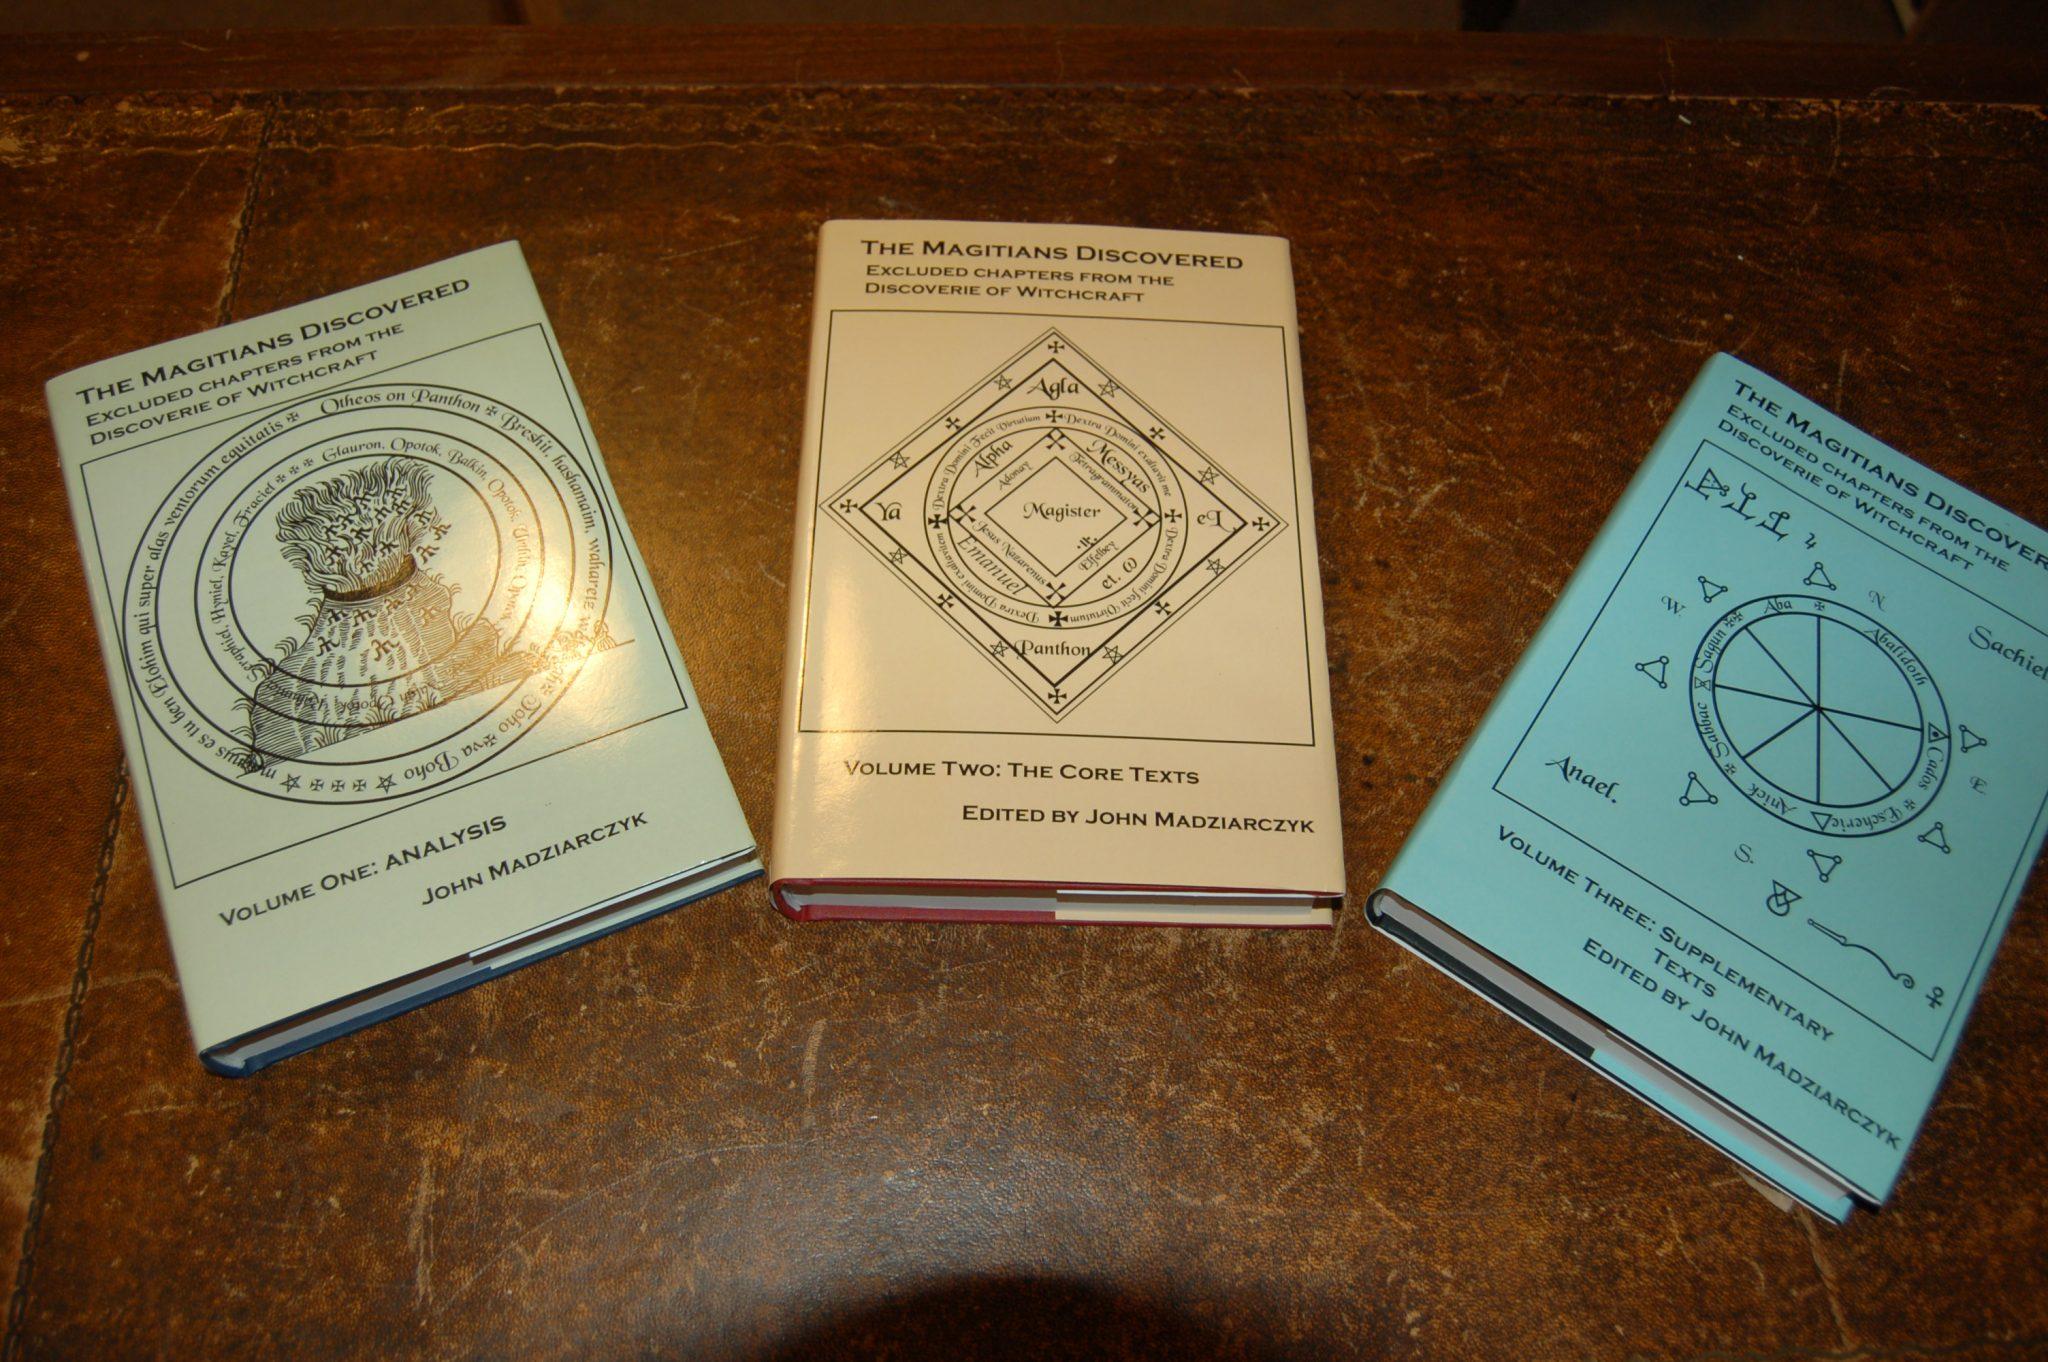 Wonderful three volume book donation